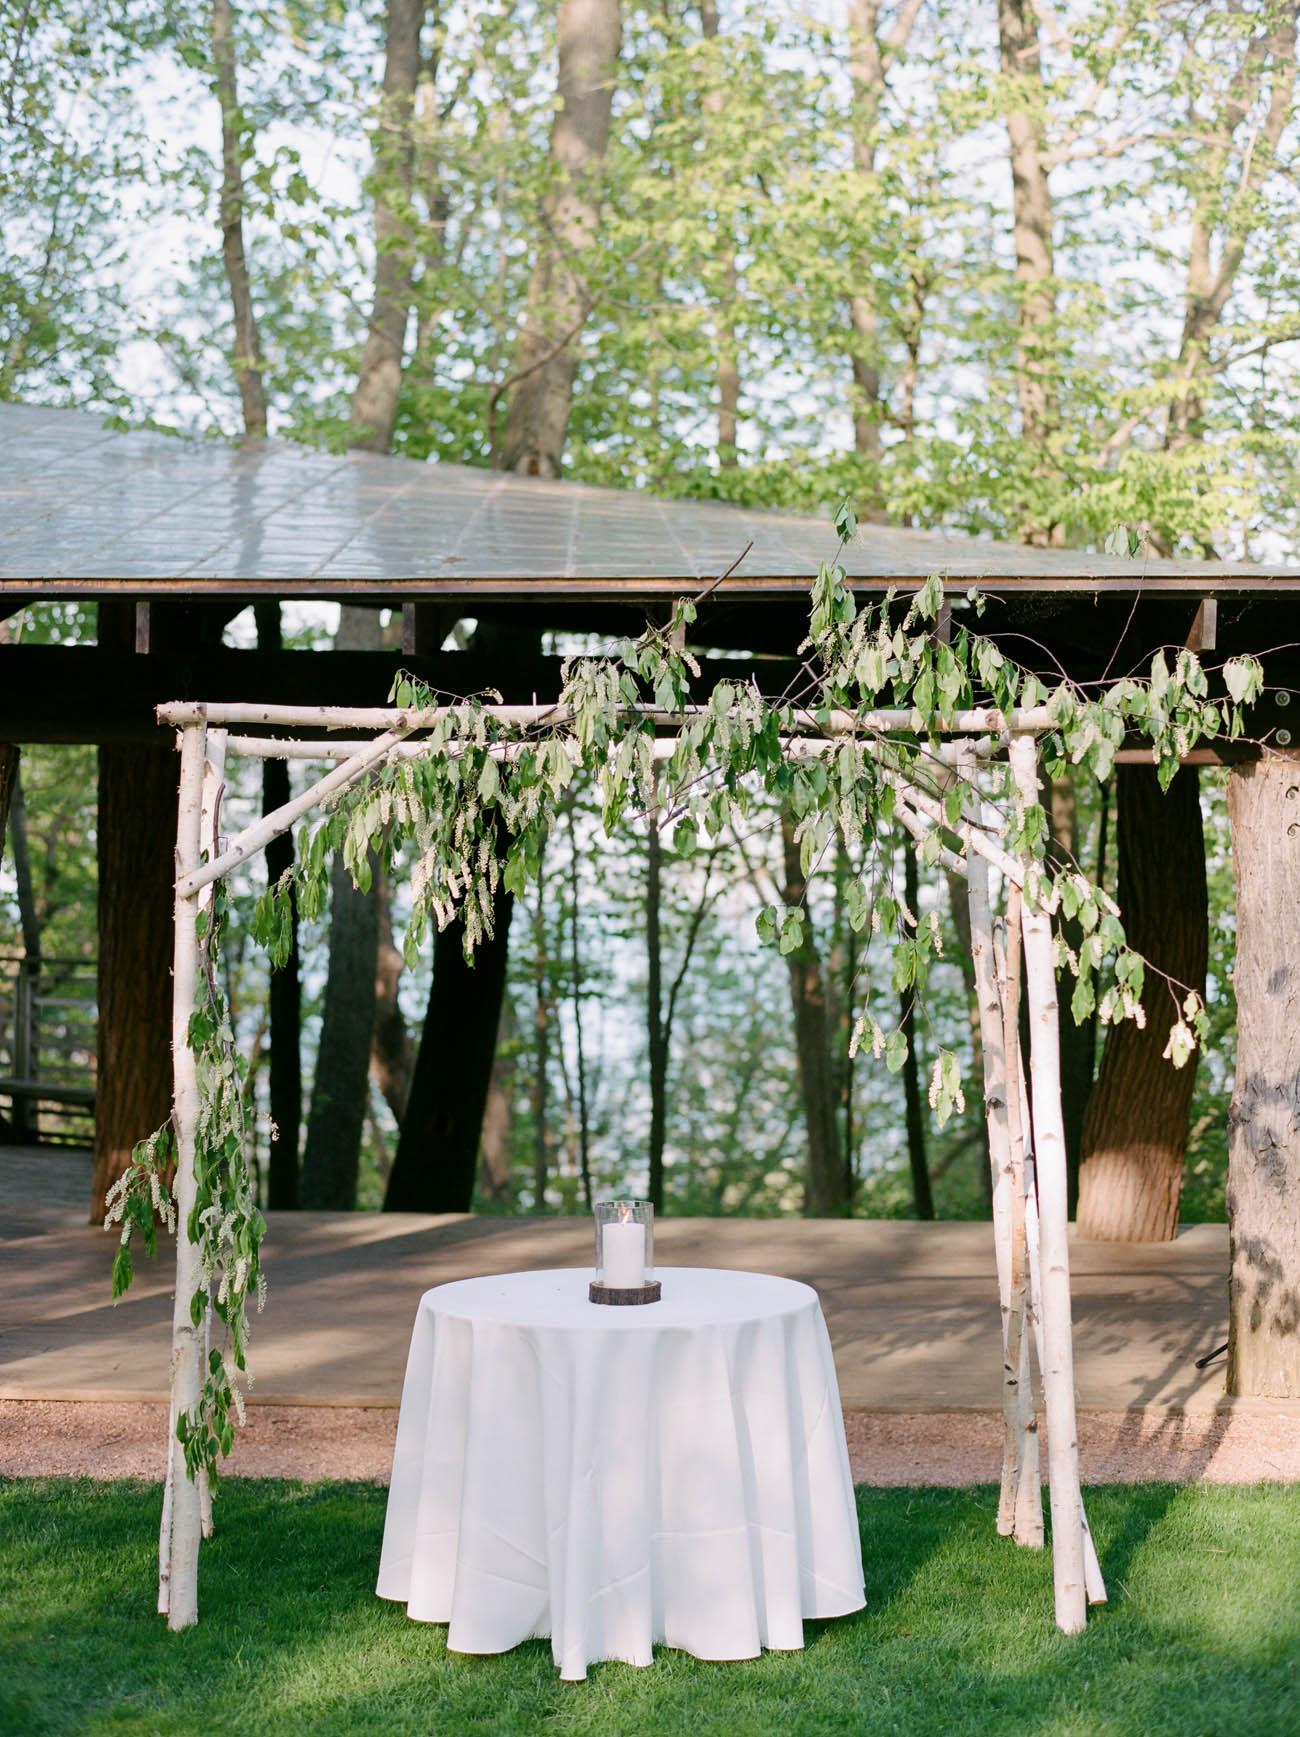 kateweinsteinphoto_schlitz_audubon_milwaukee_wedding-188.jpg